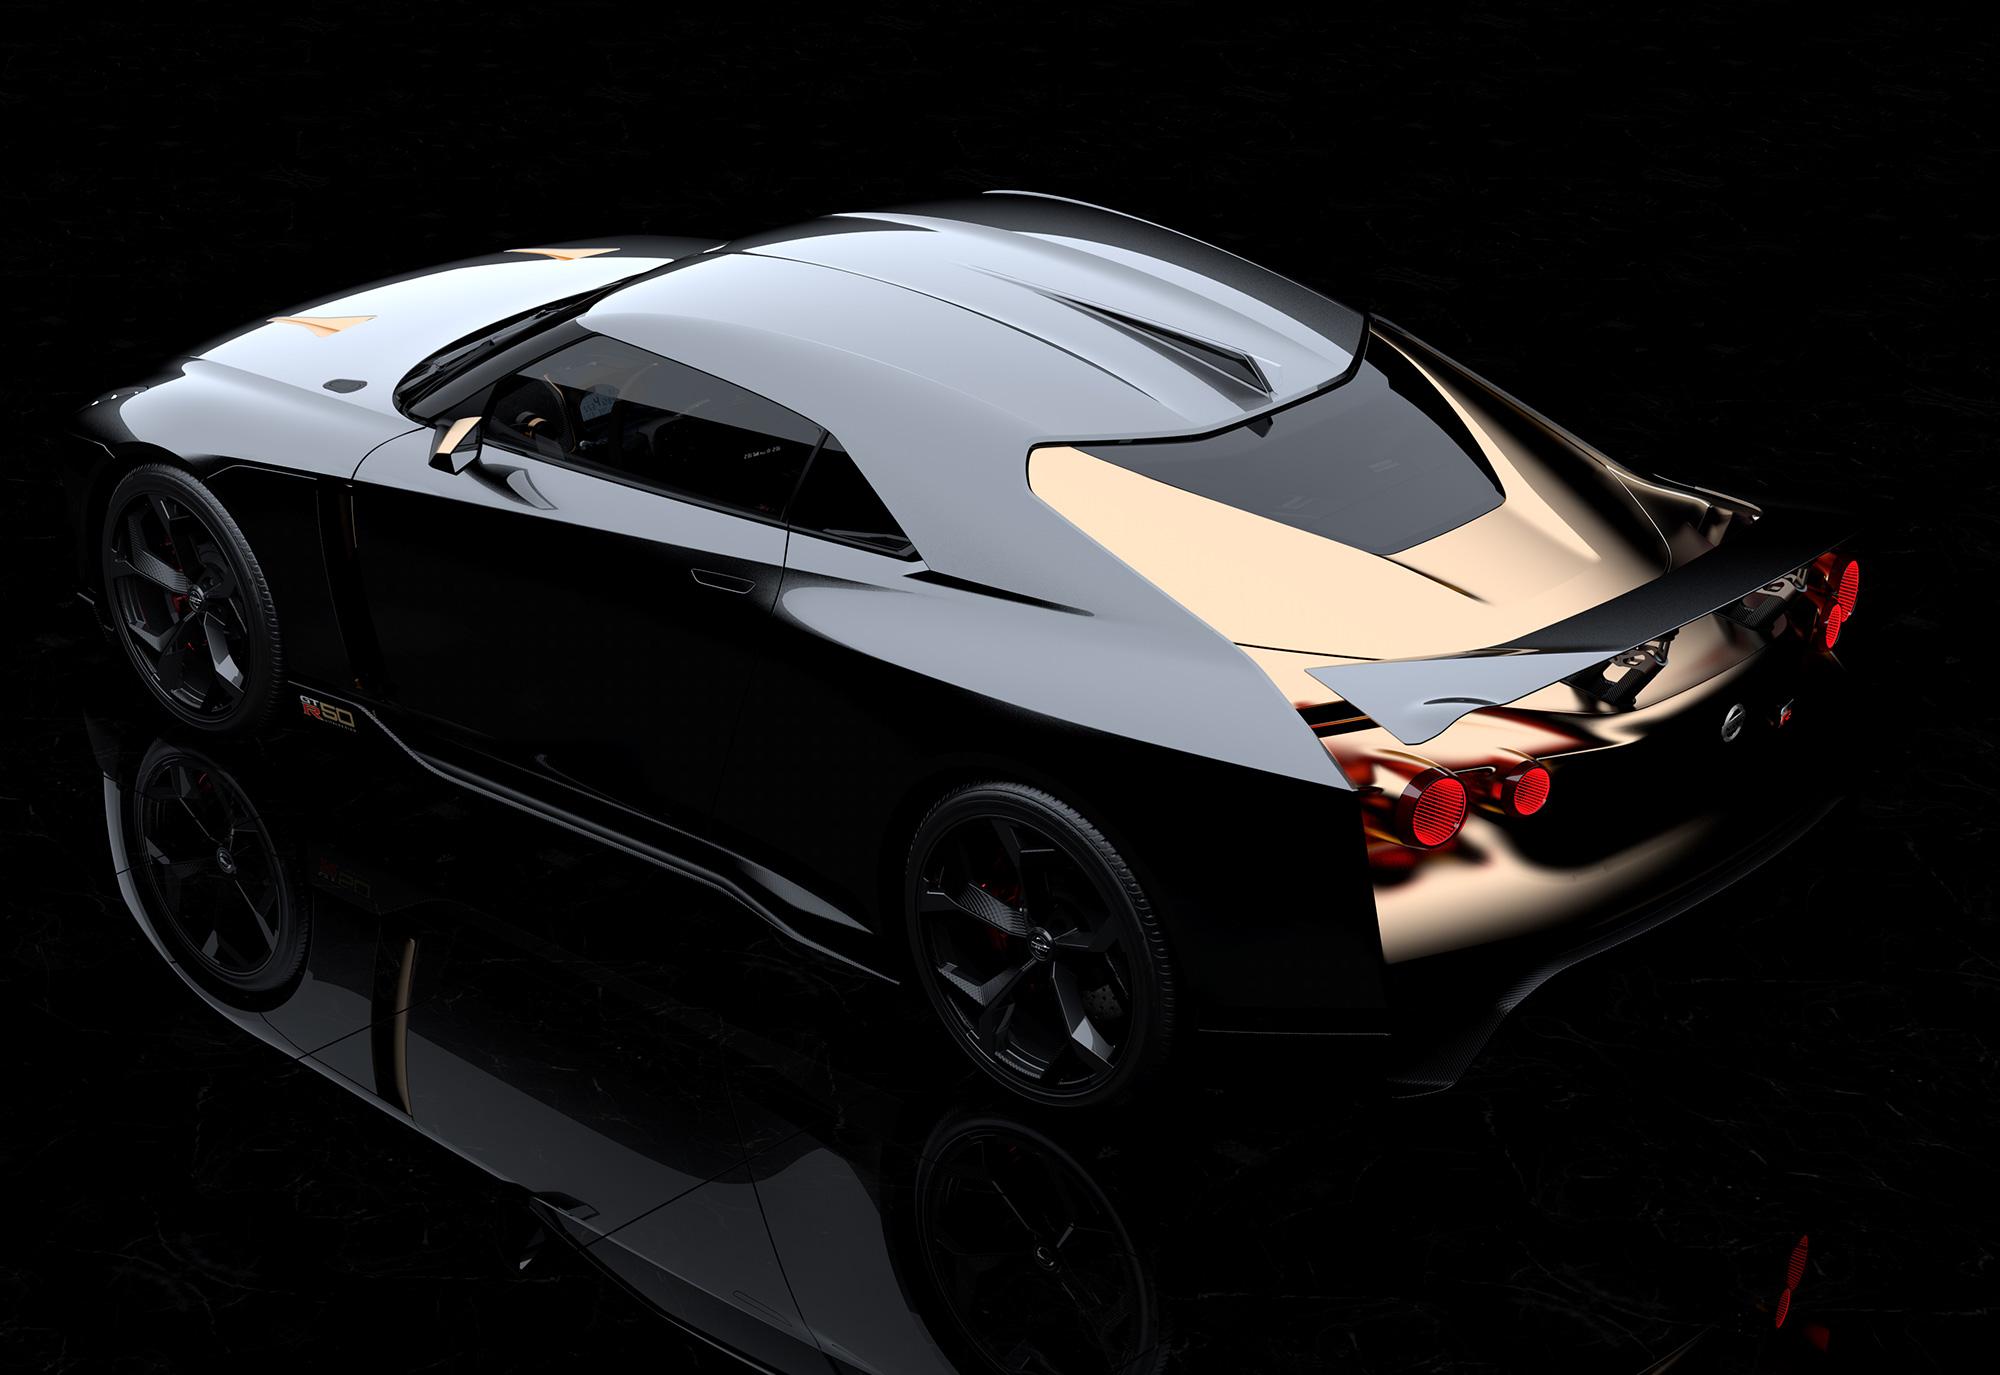 2018-06-26-Nissan-GT-R50-by-Italdesign-EXTERIOR-IMAGE-2.jpg